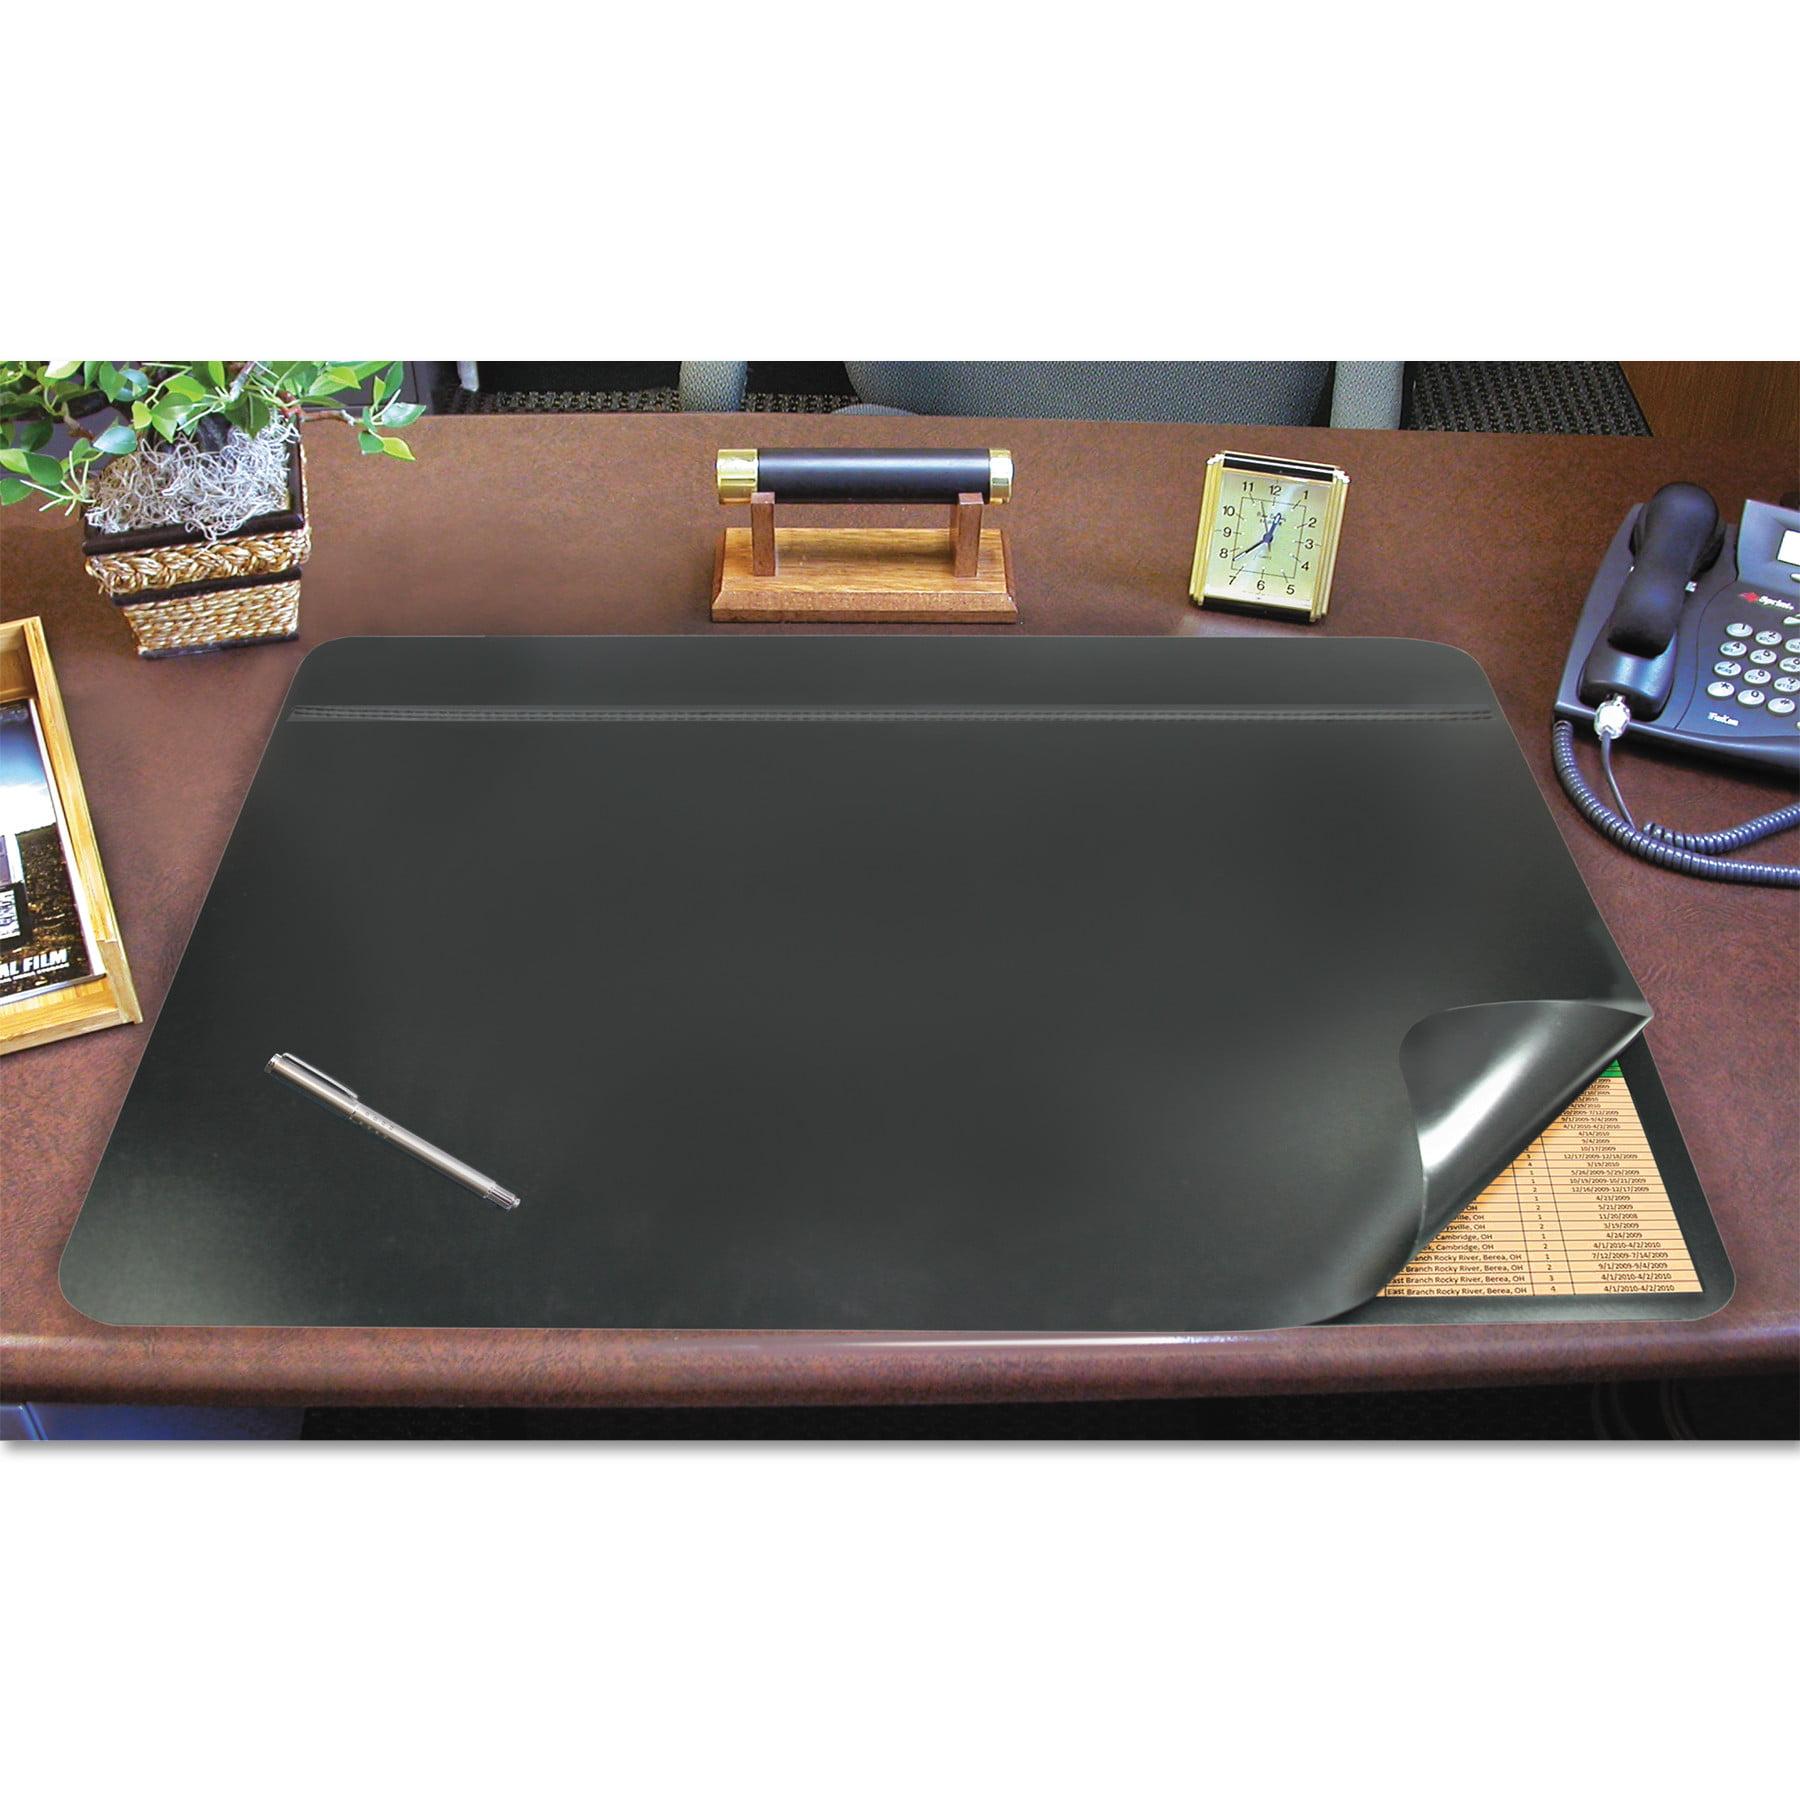 Artistic Hide-Away PVC Desk Pad, 31 x 20, Black -AOP48043S by ARTISTIC LLC